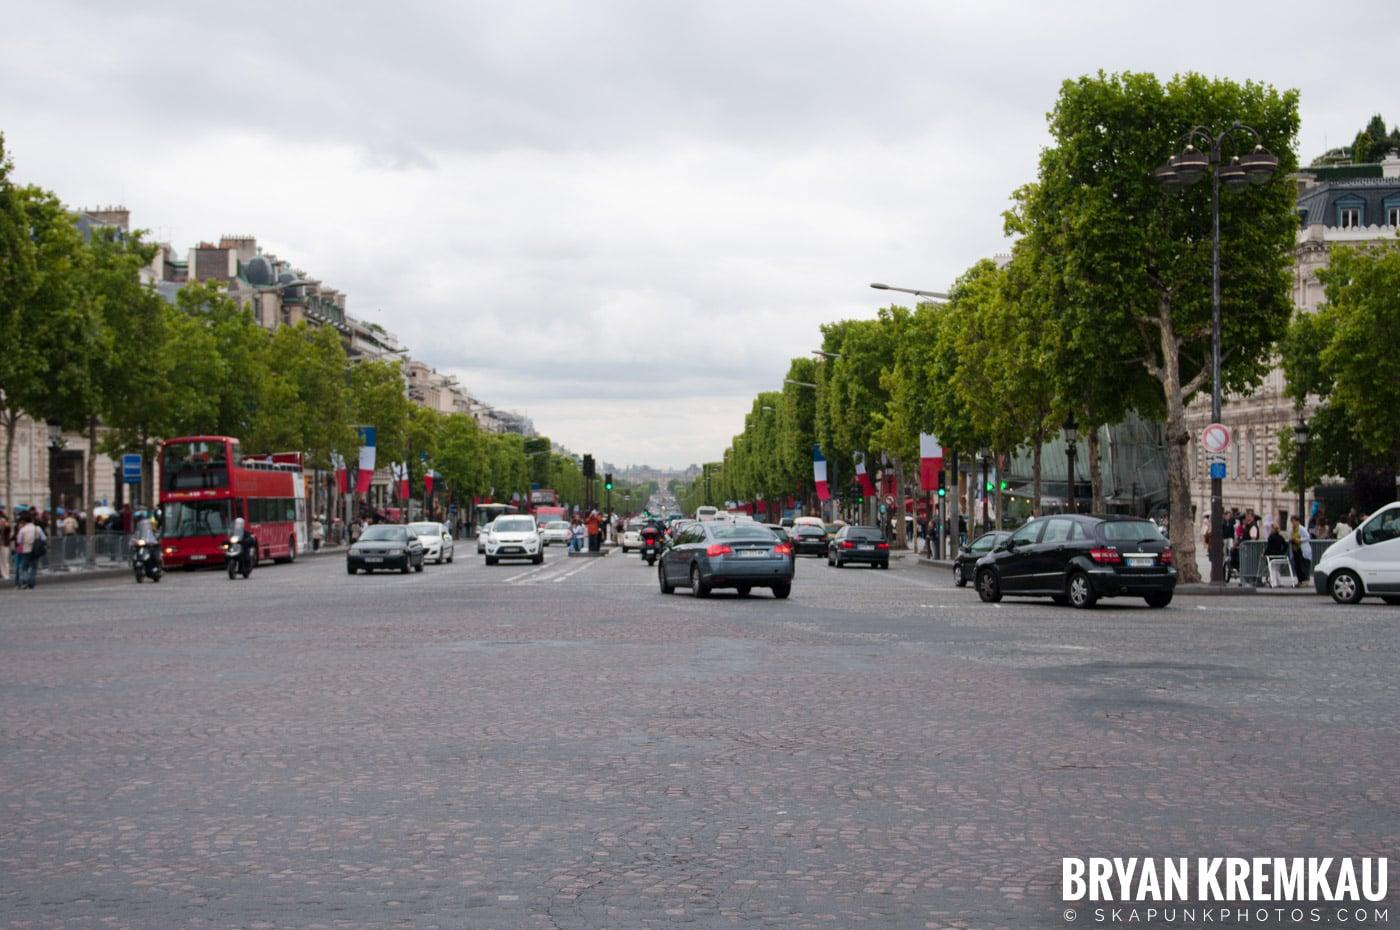 Paris, France Honeymoon - Day 3 - 7.20.11 (36)